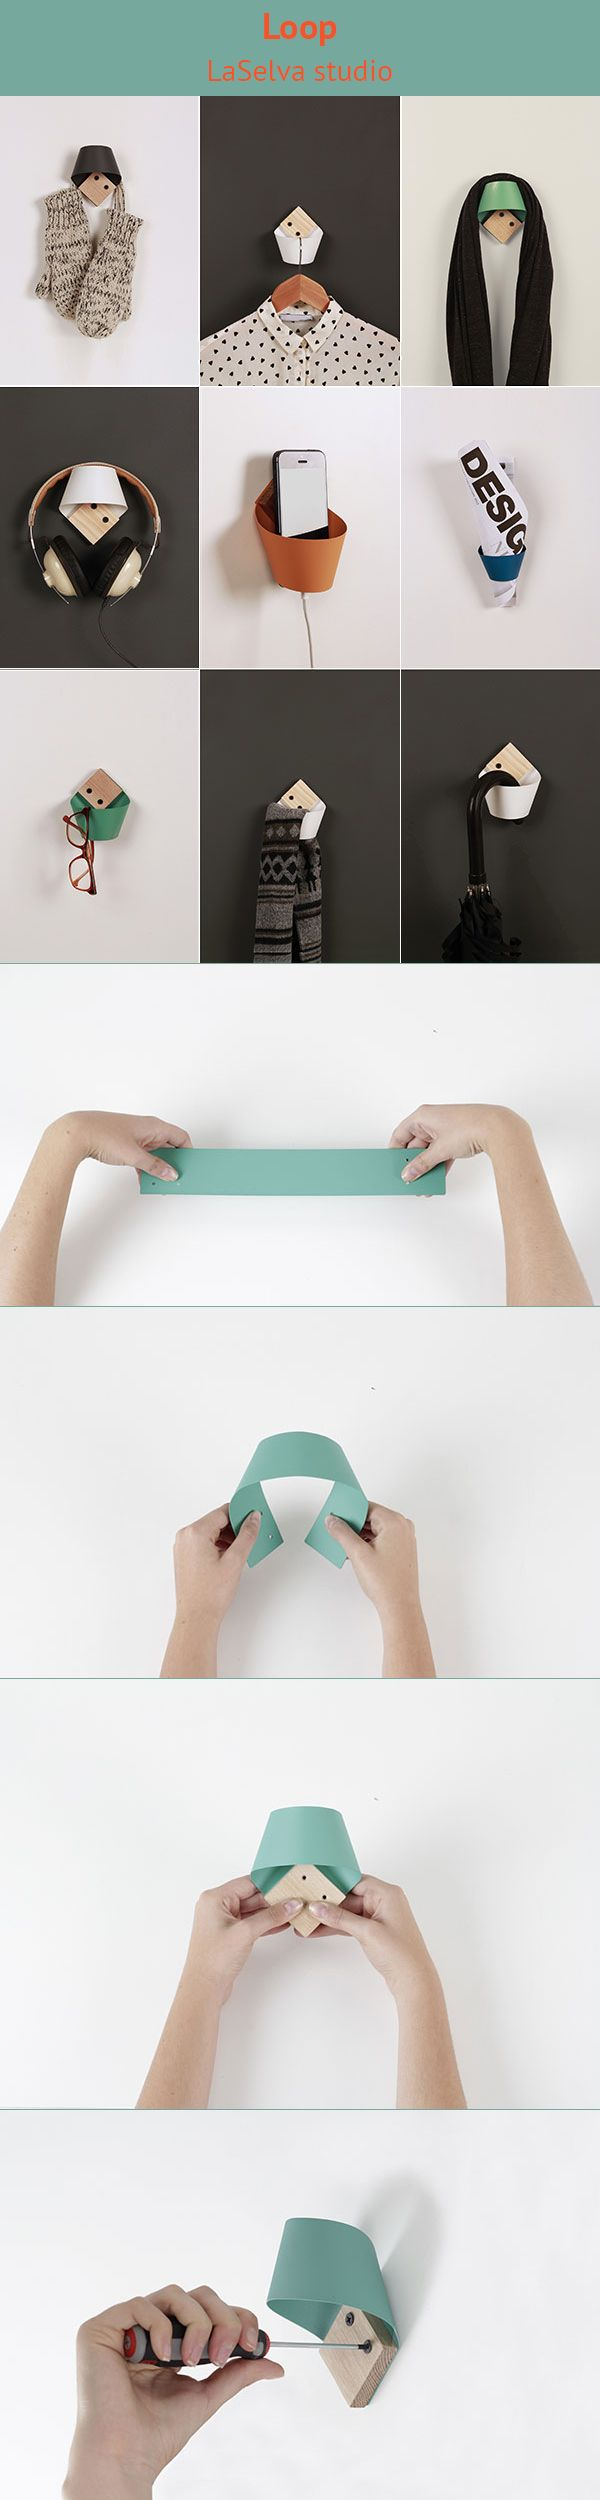 Loop - LaSelva design studio